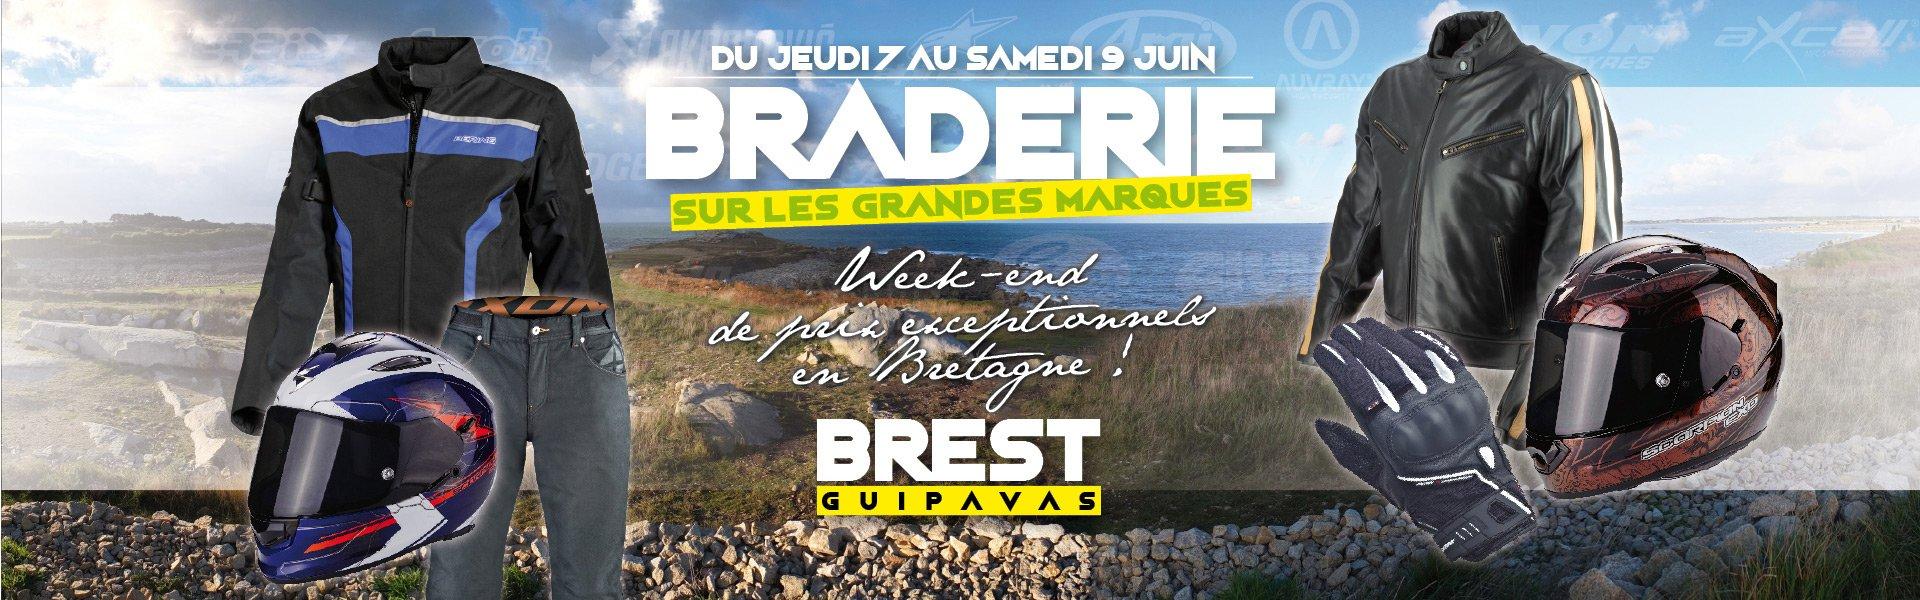 Braderie Cardy Brest 2018